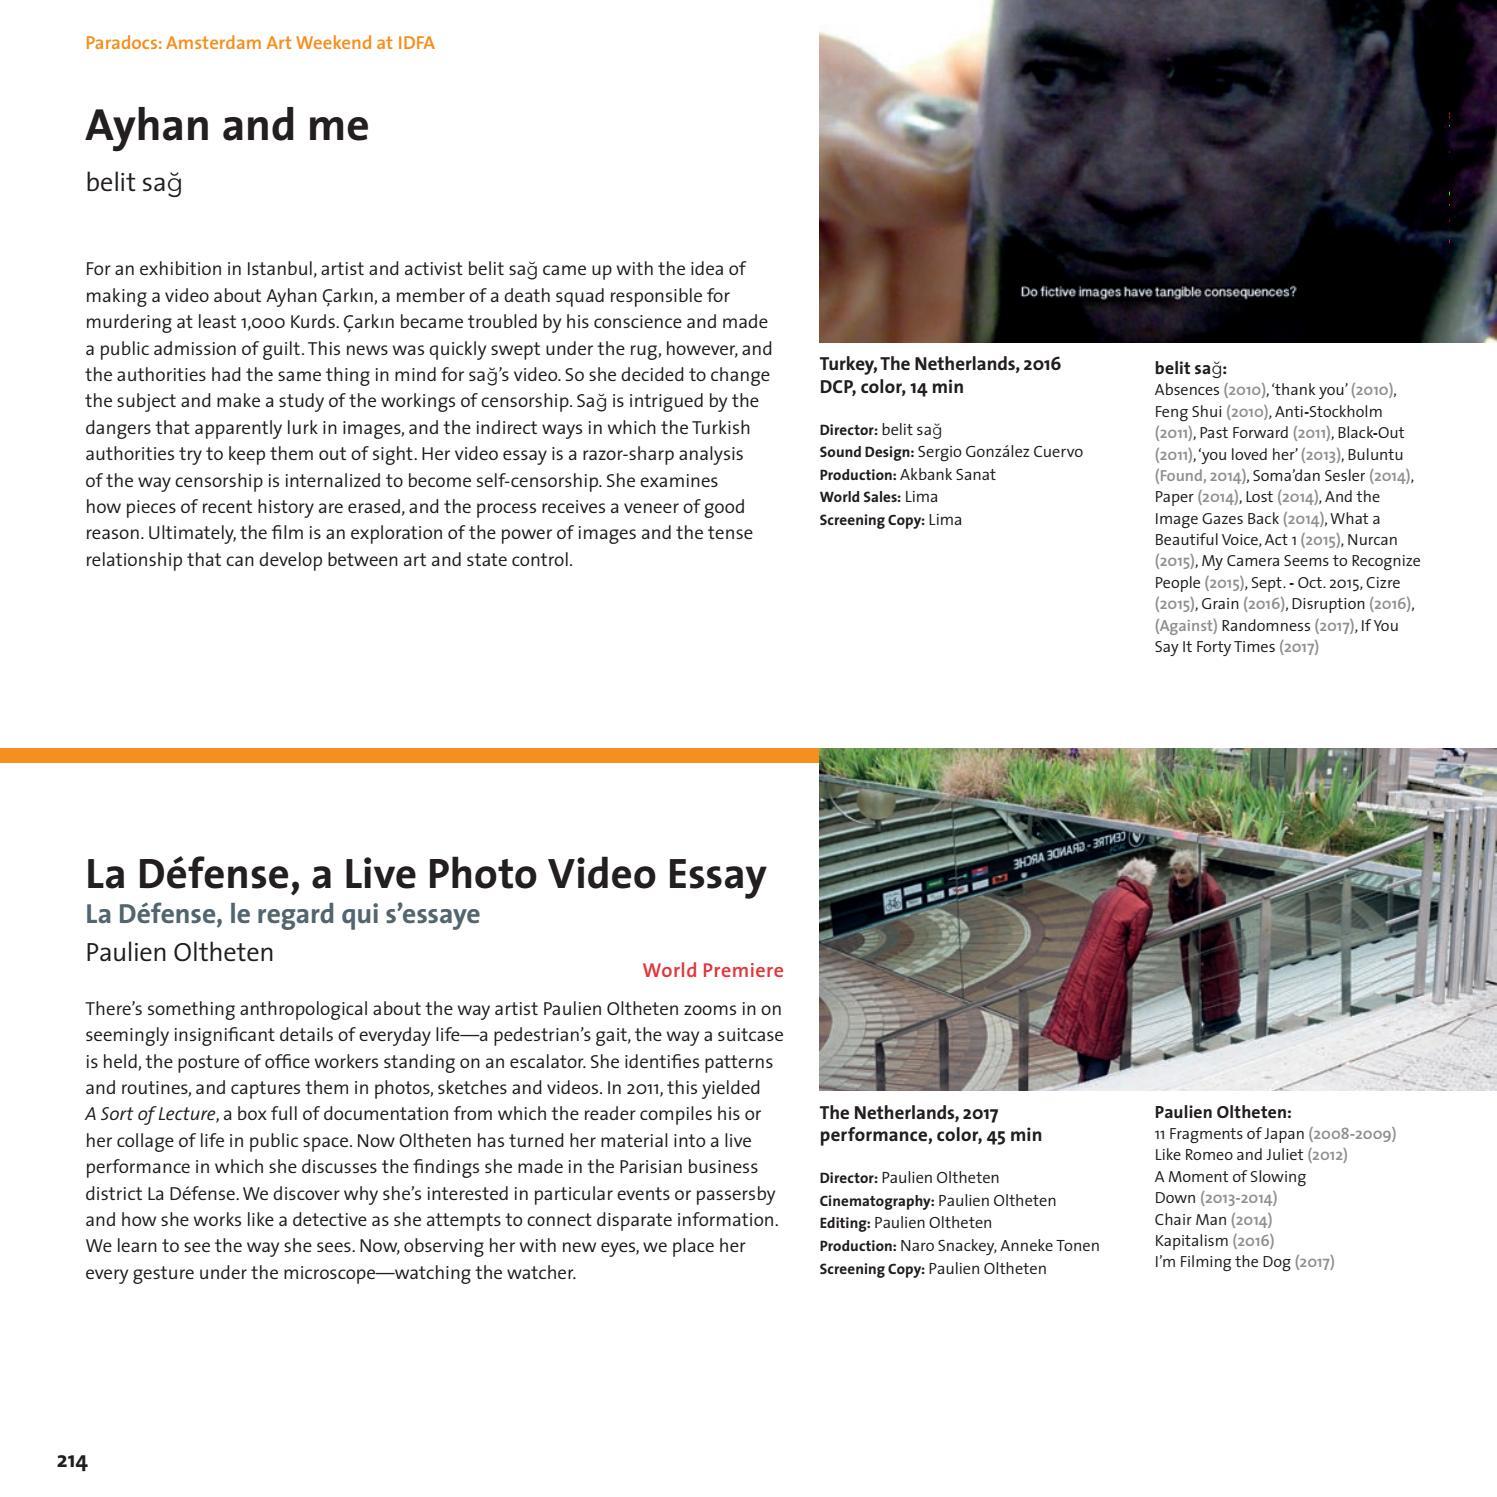 IDFA Catalogue 2017 by IDFA International Documentary Film Festival